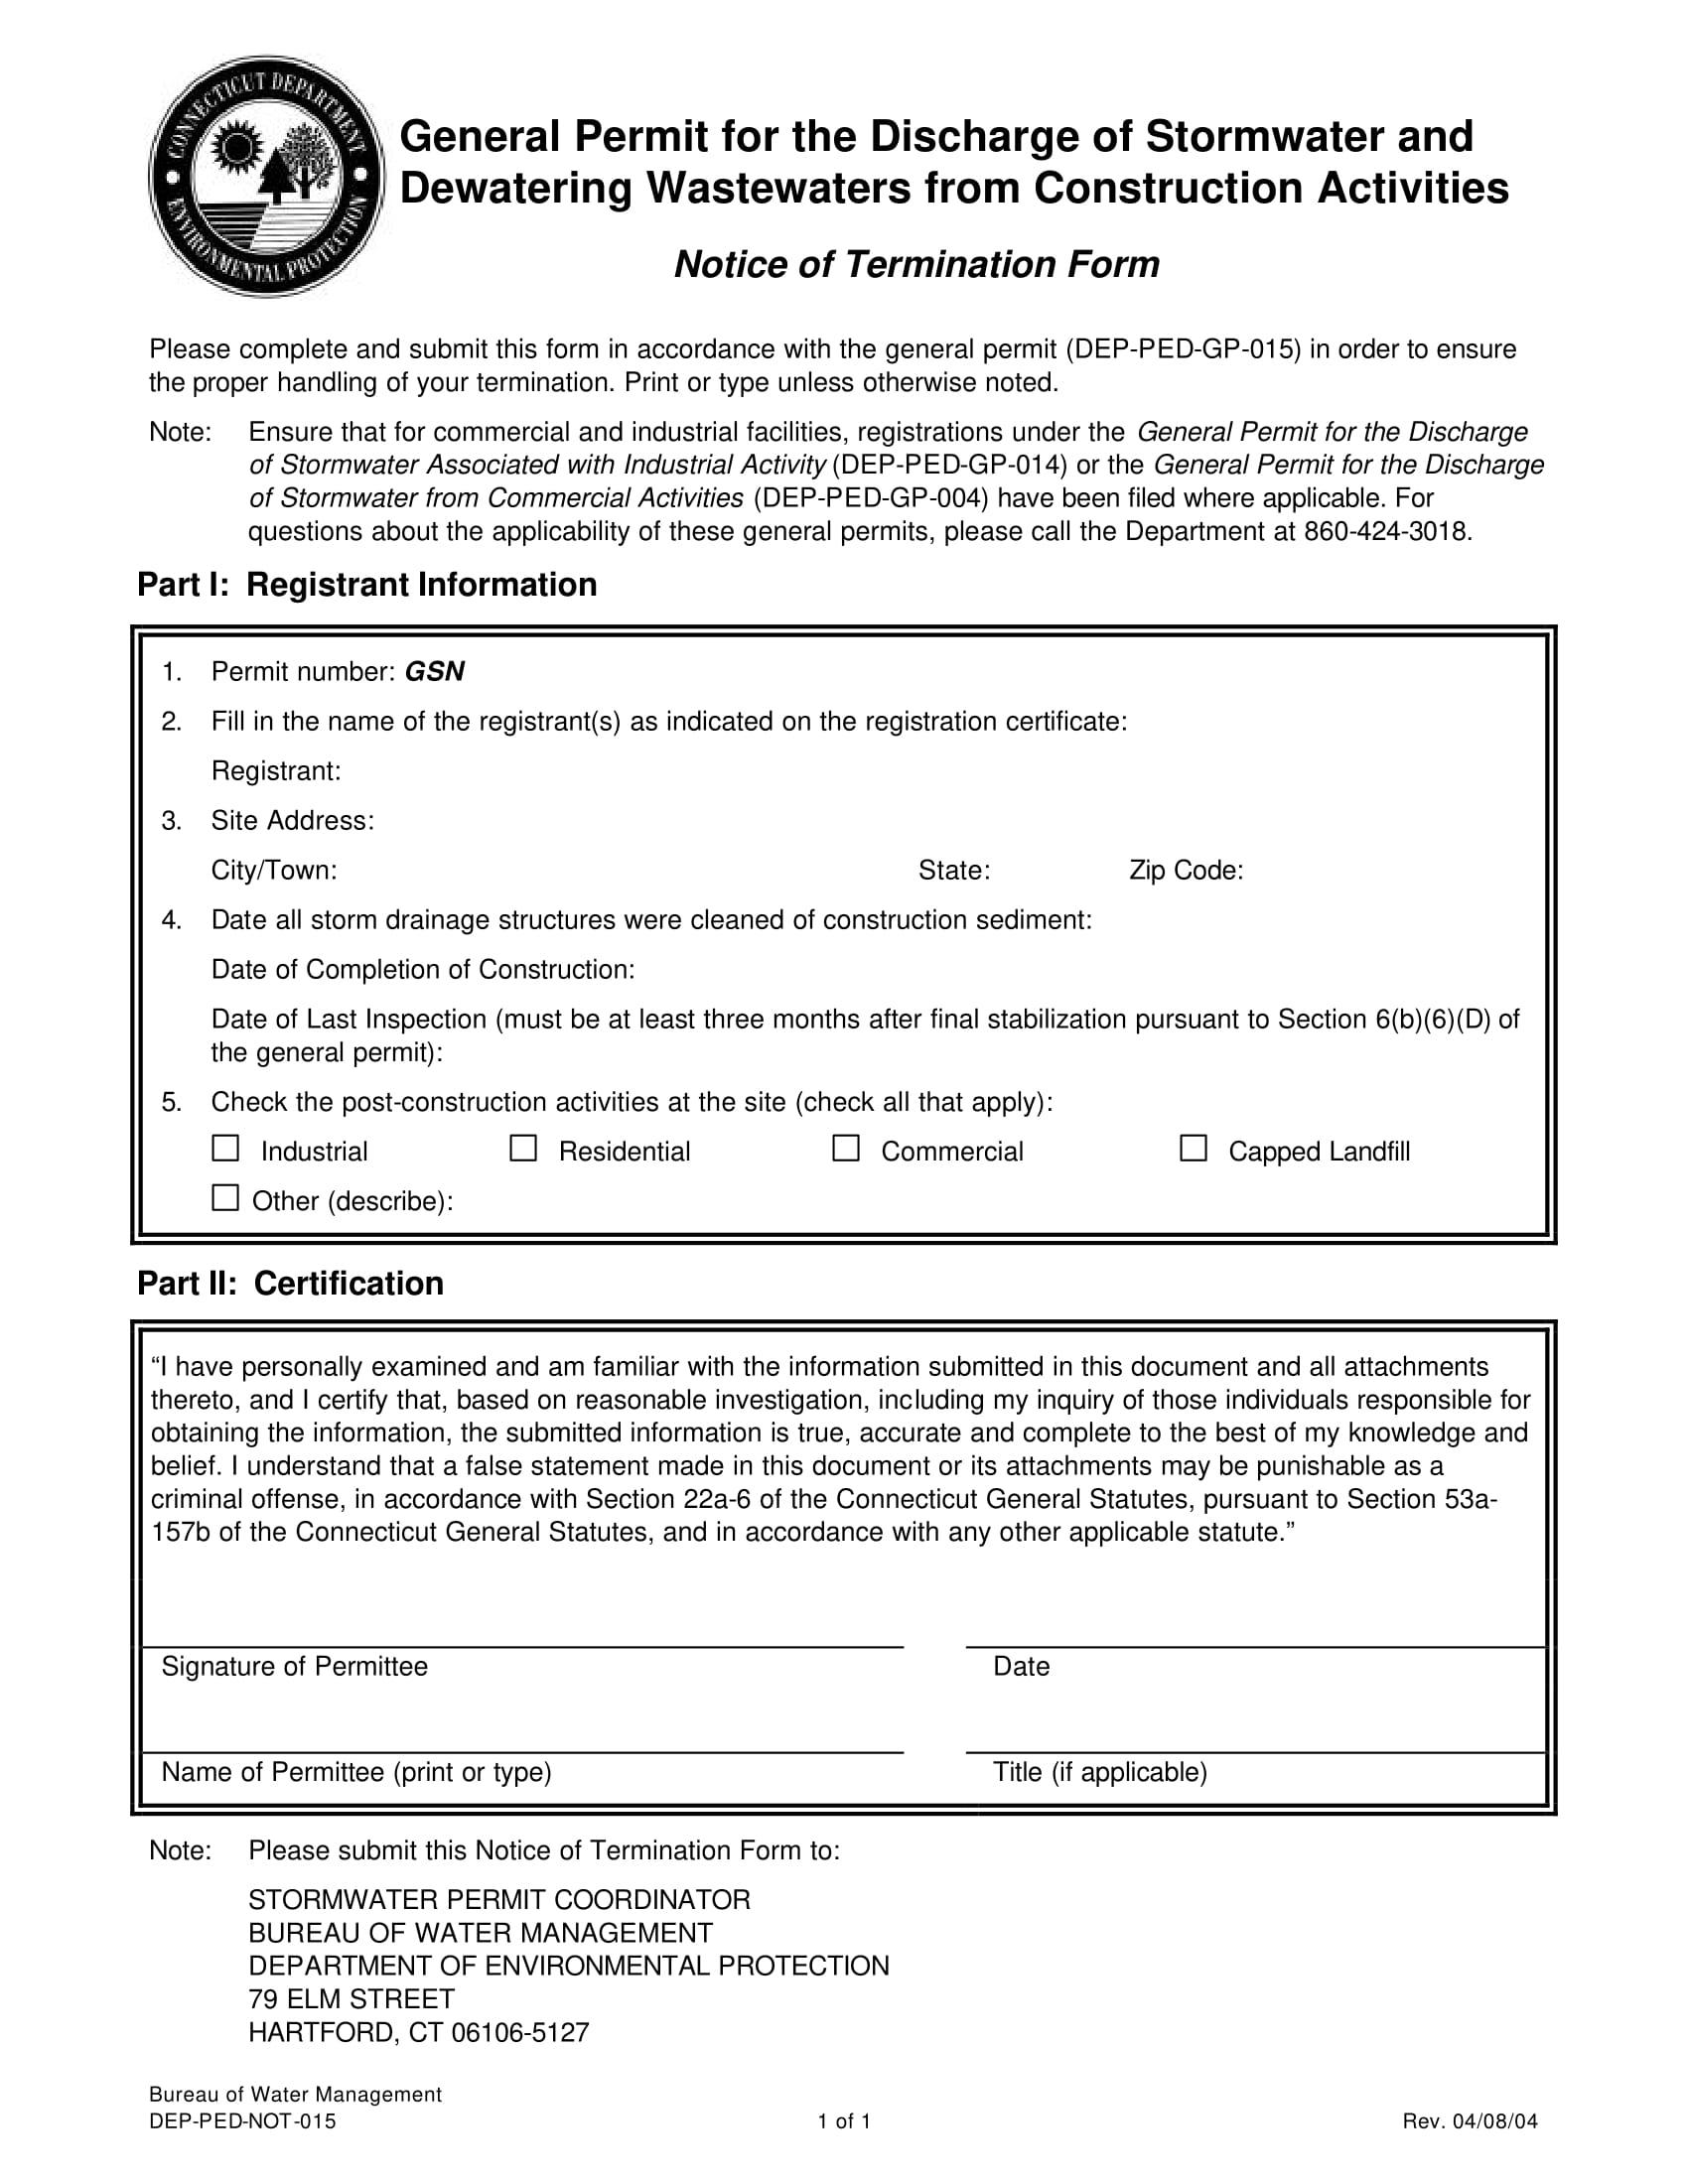 construction notice of termination form 1